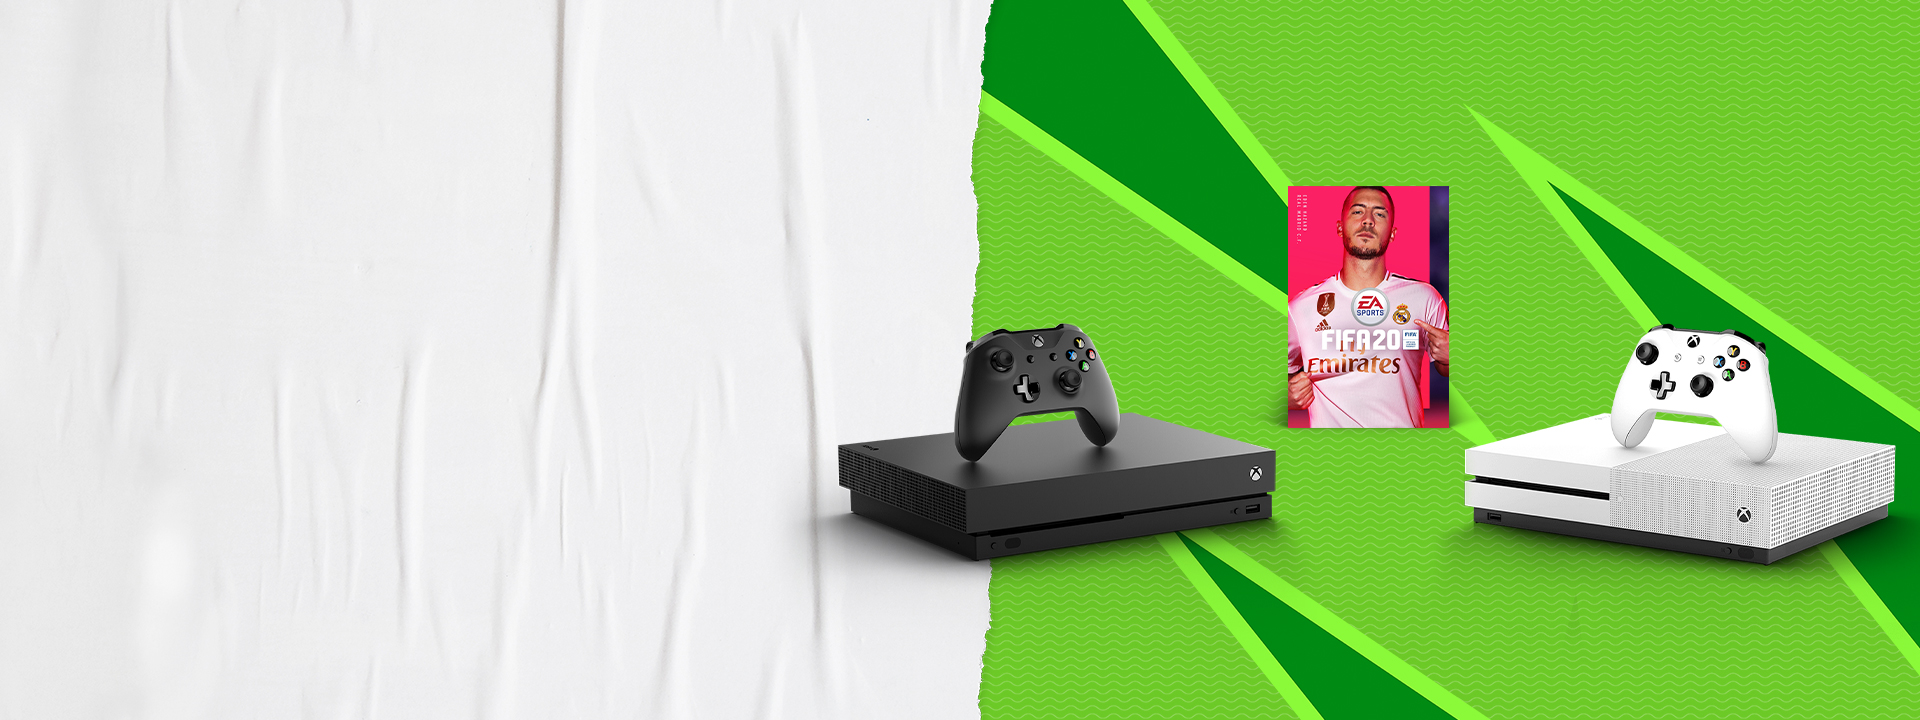 Xbox One에 ₩61,200 할인받고 FIFA 20을 구매하세요